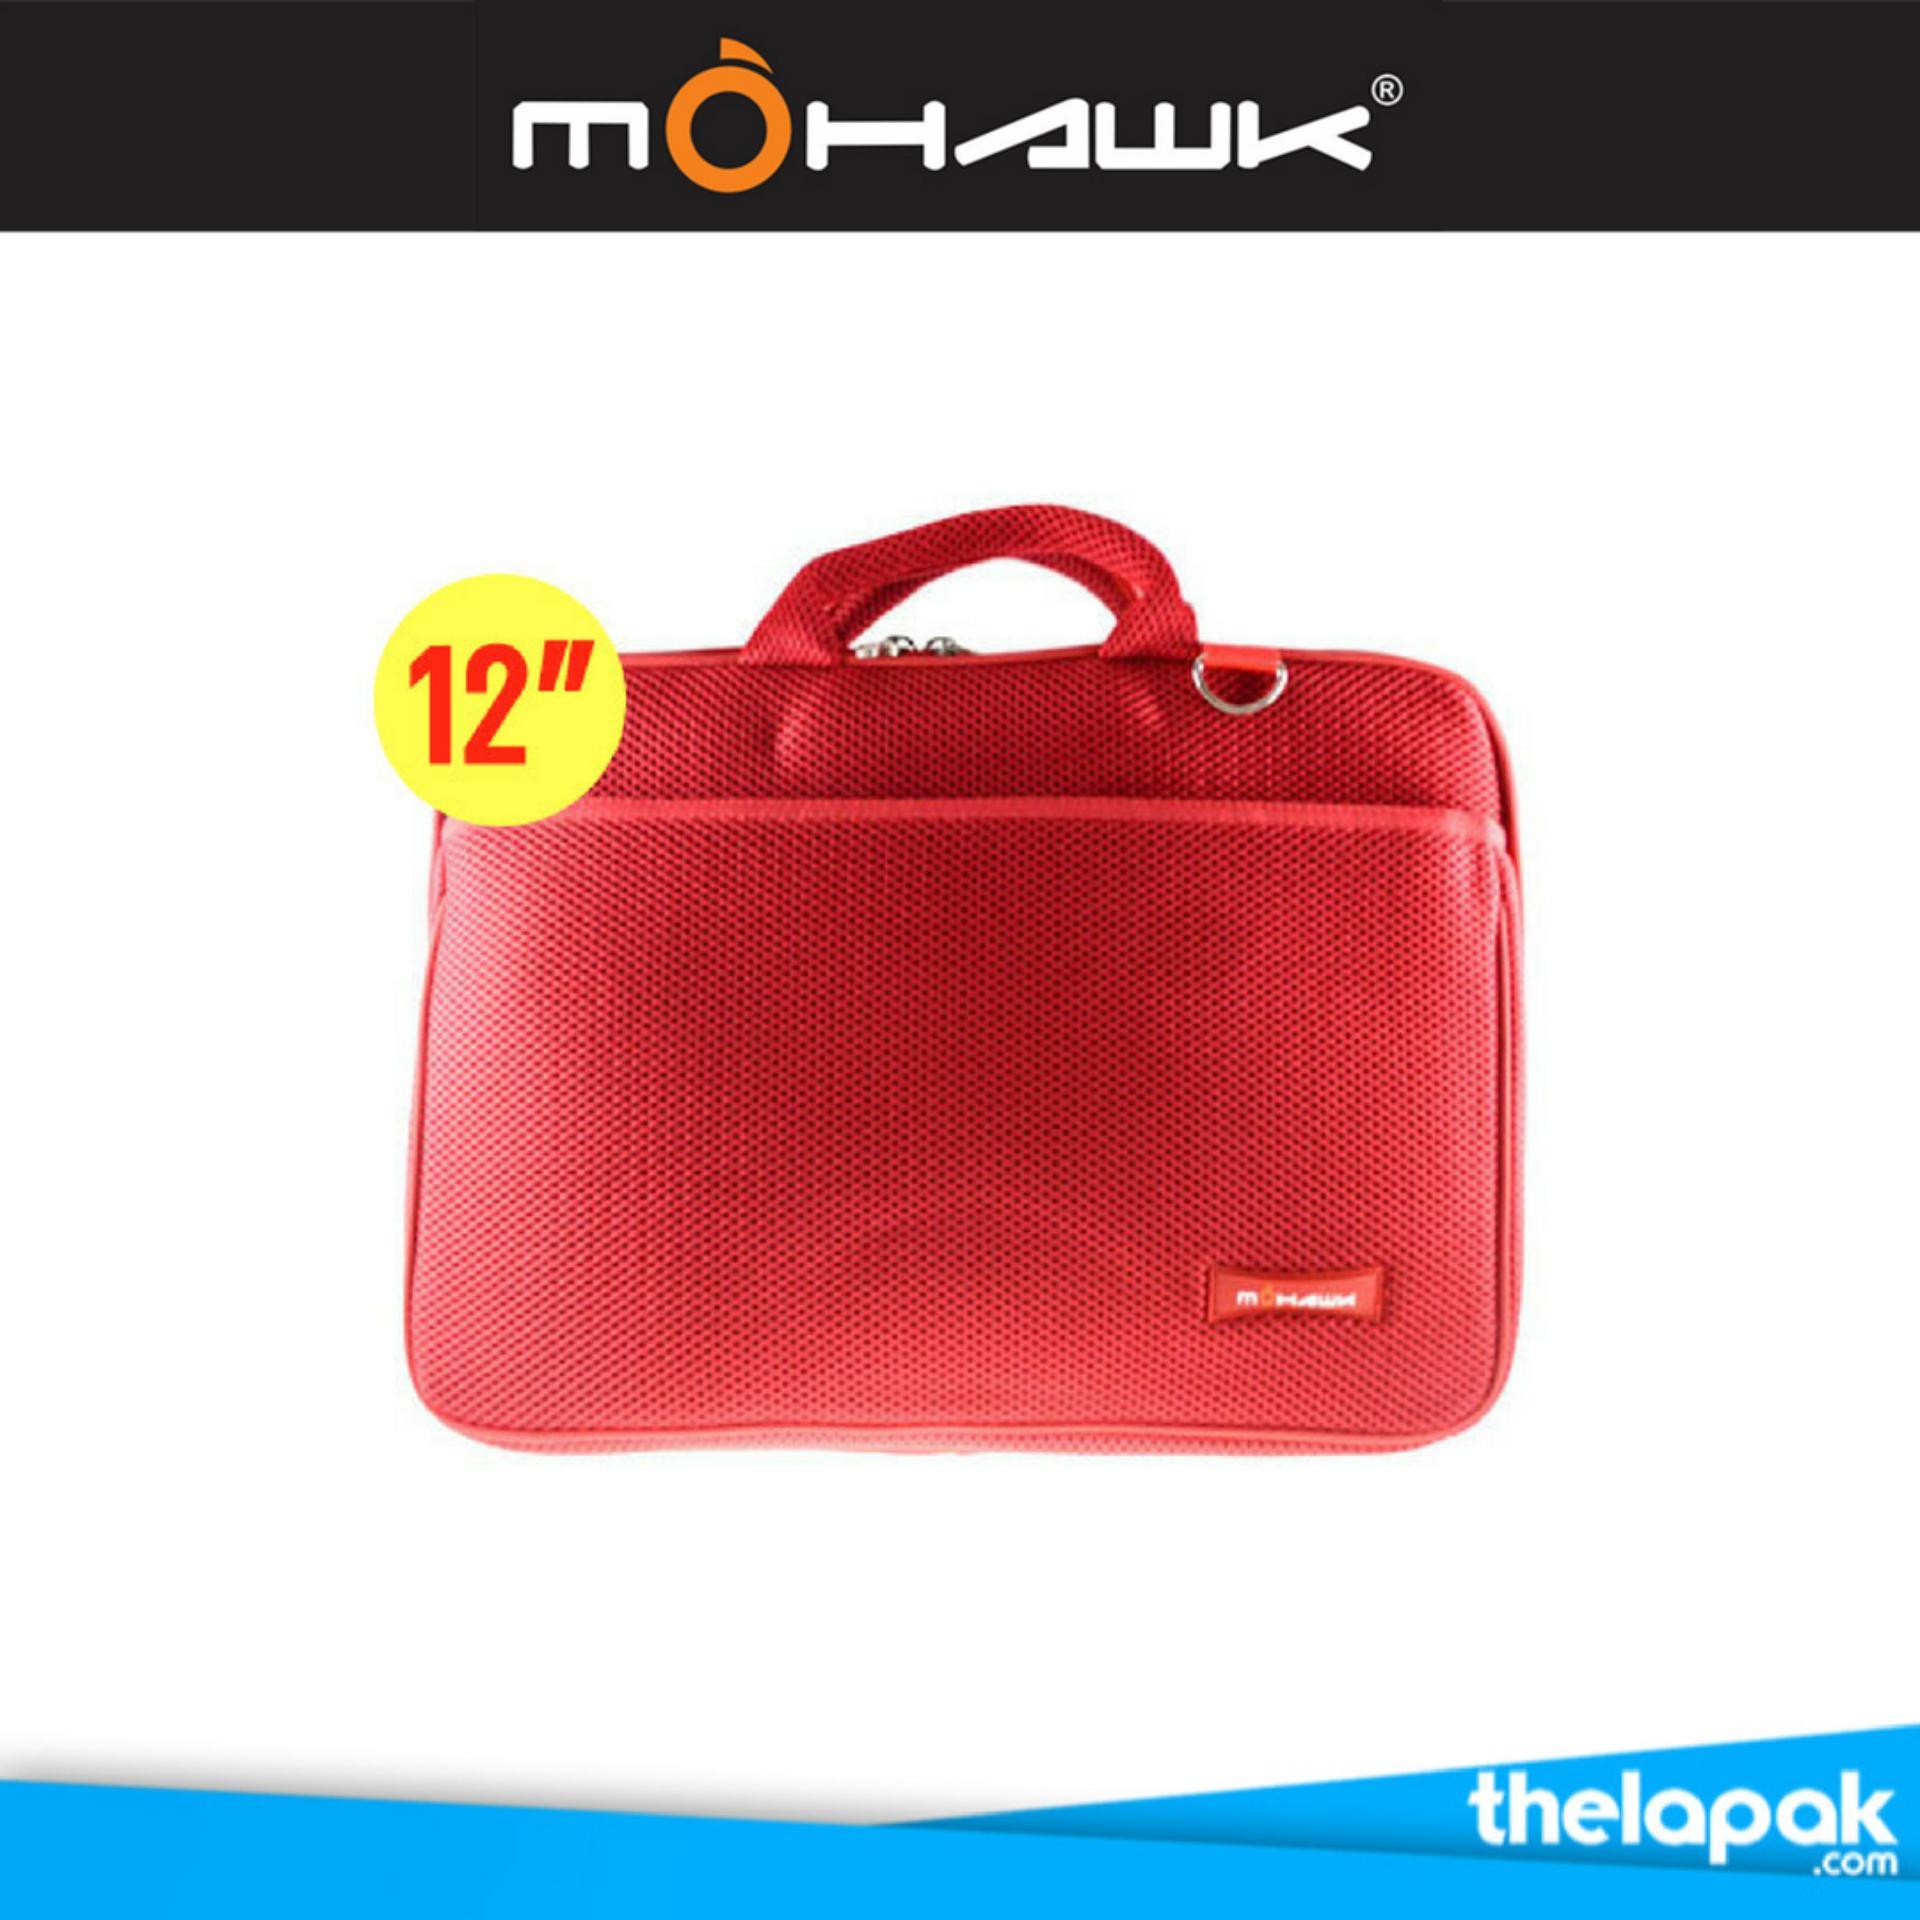 Toko Mohawk Notebook Softcase 3008 12 Polos Merah Yang Bisa Kredit